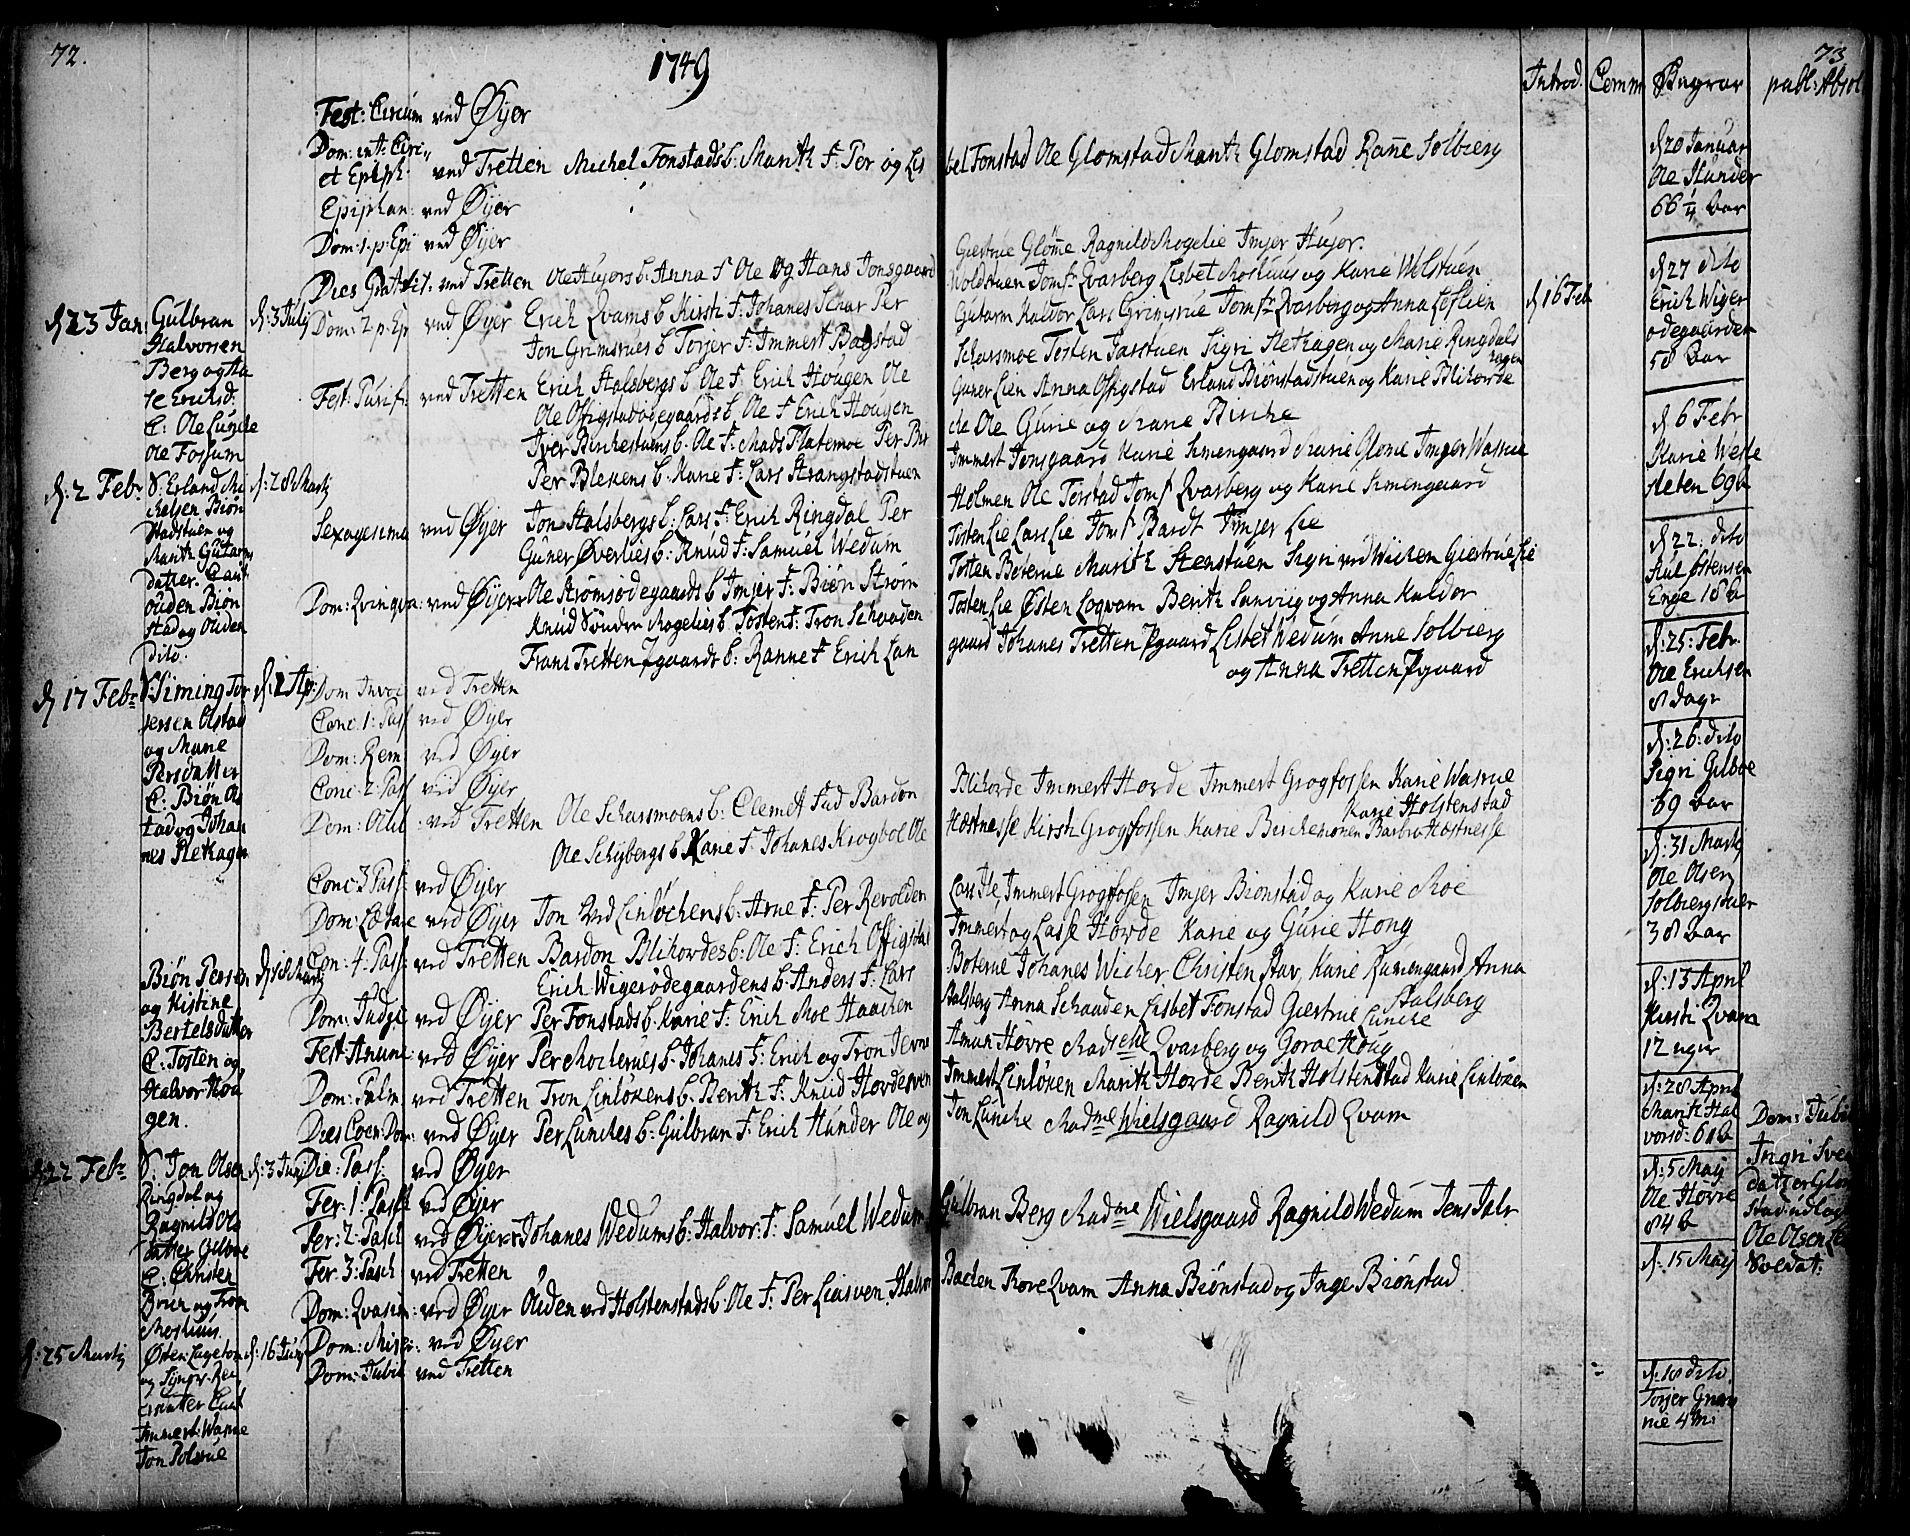 SAH, Øyer prestekontor, Ministerialbok nr. 2, 1733-1784, s. 72-73